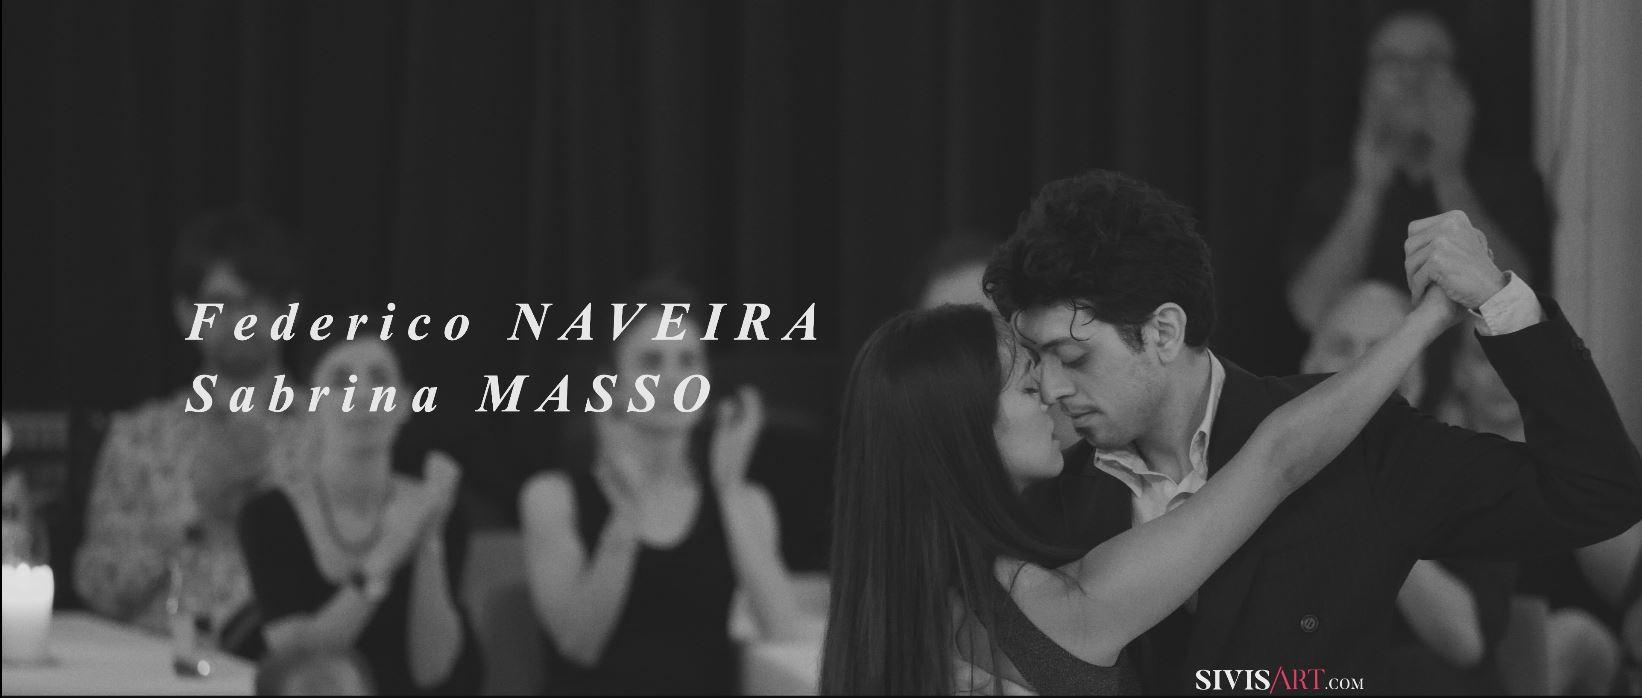 Sivis'art Videomaker presents Federico Naveira & Sabrina Masso